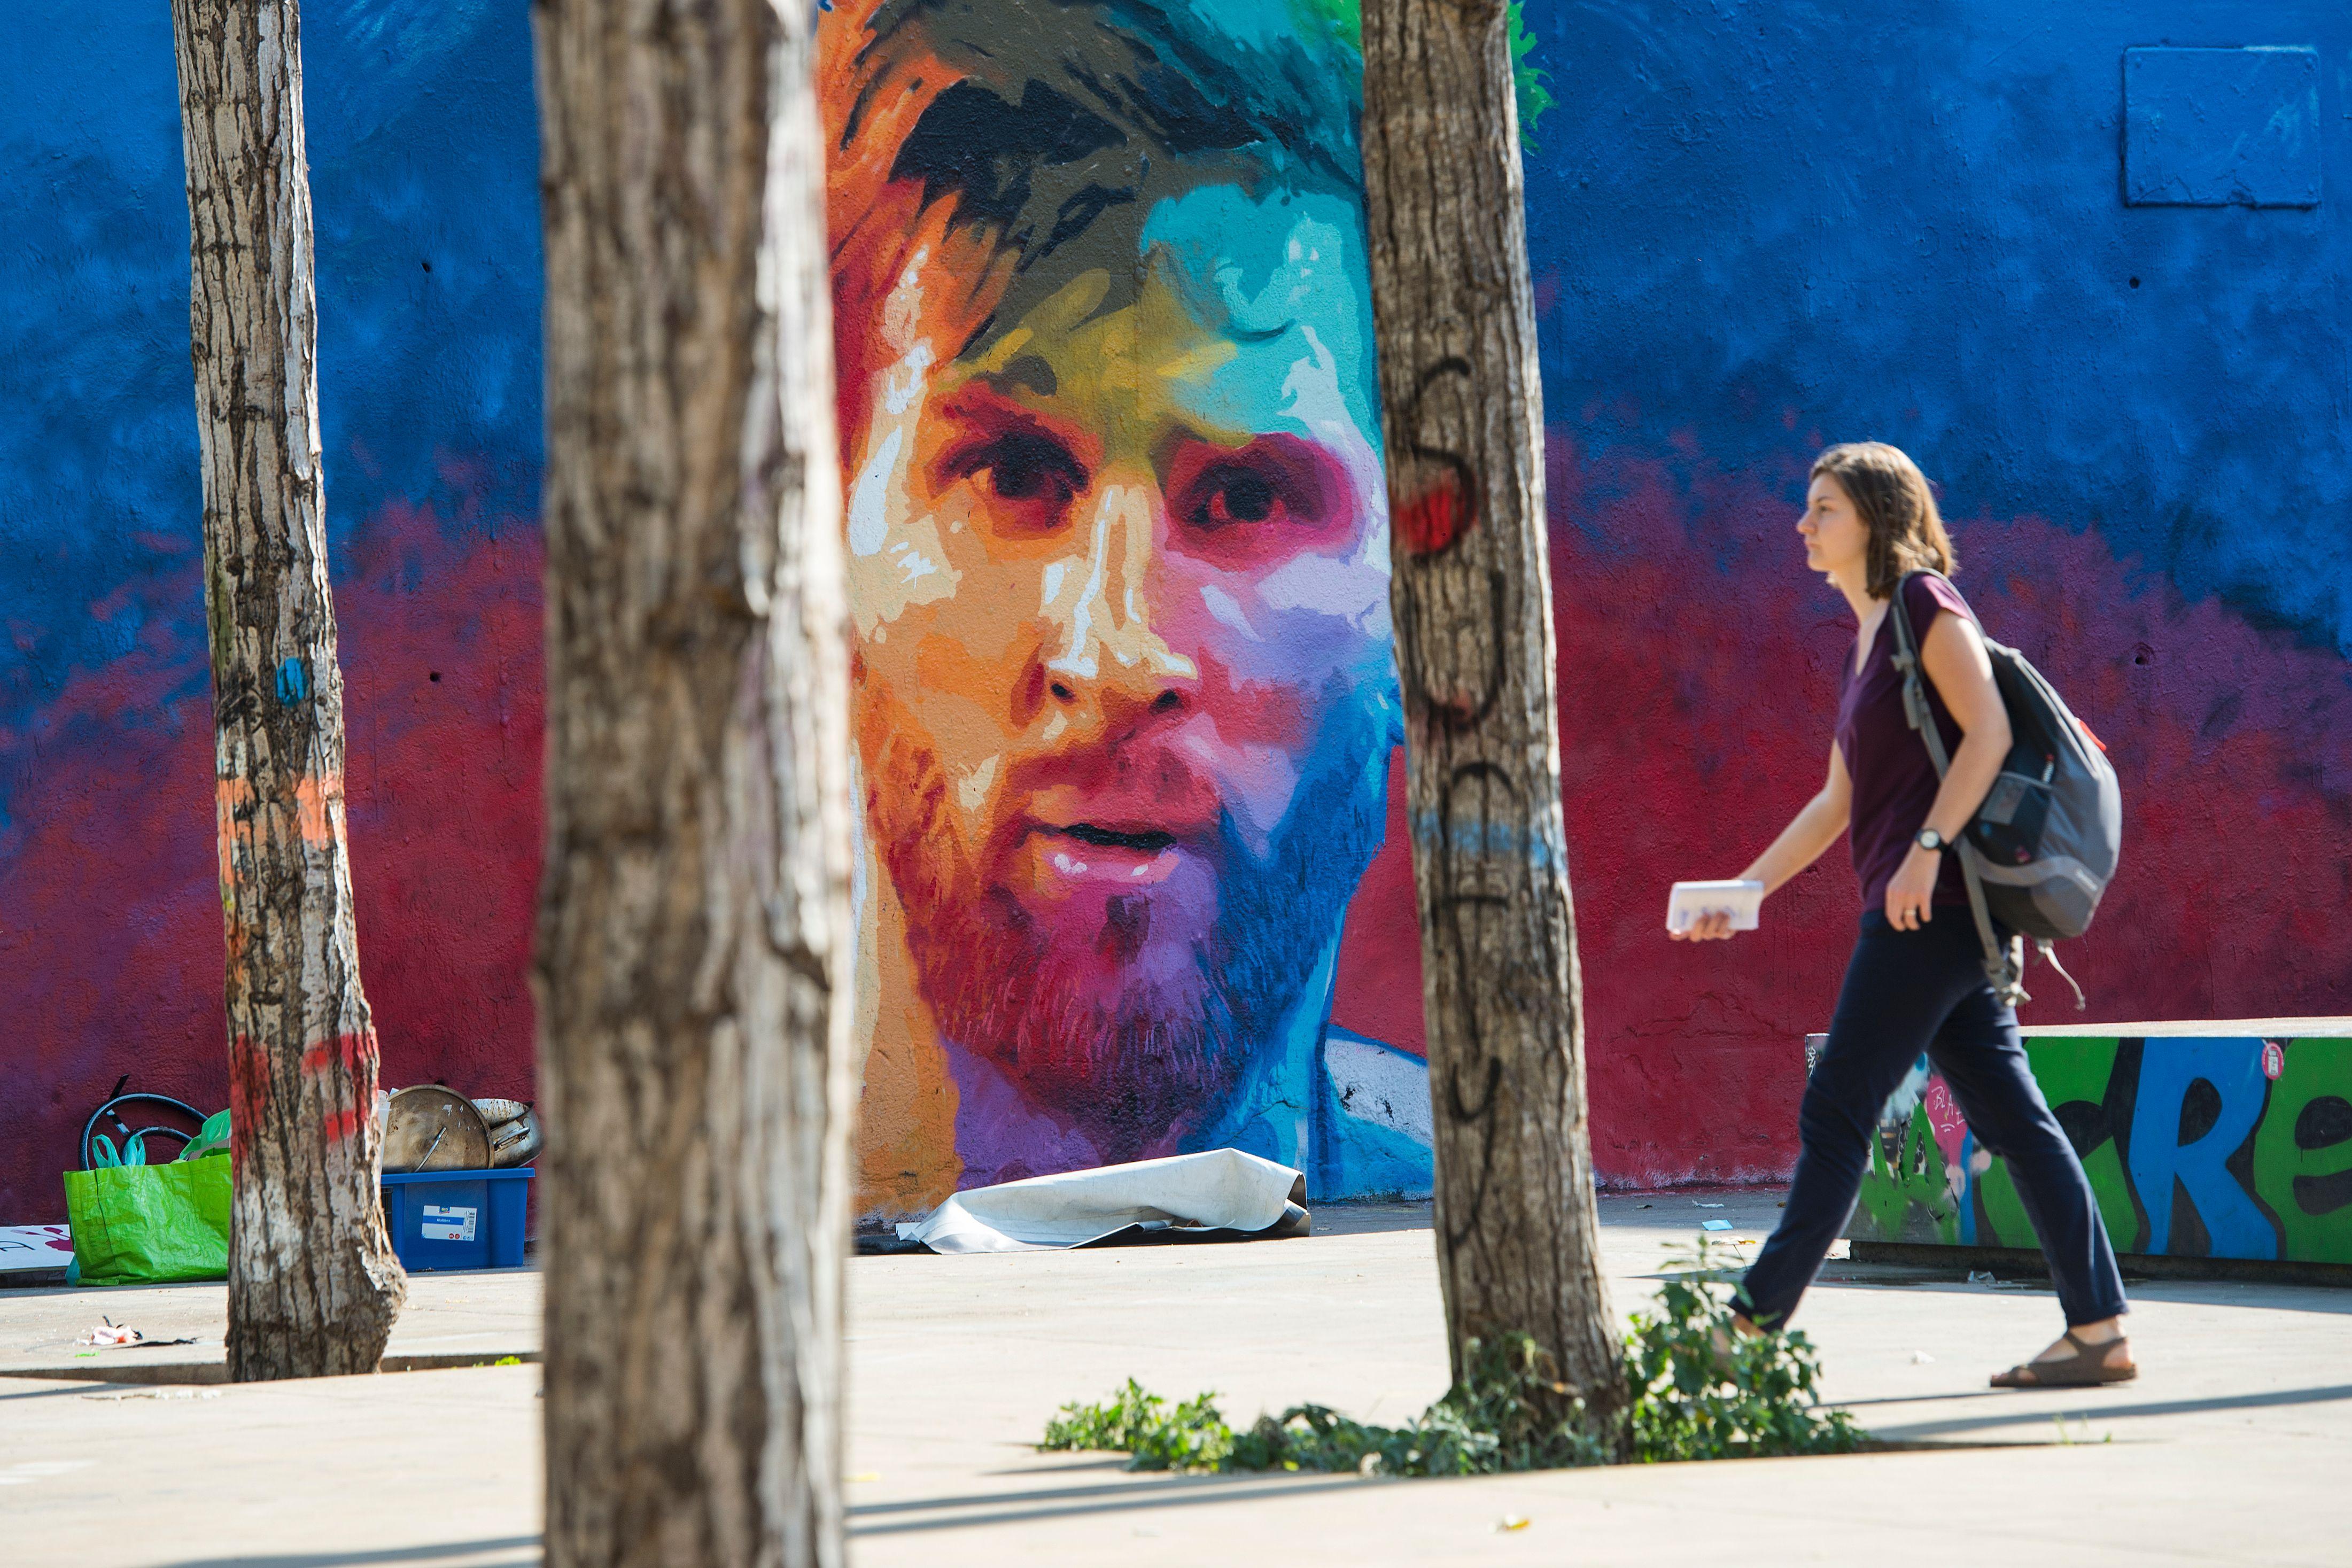 Graffiti wall barcelona - Fbl Esp Barcelona Messi